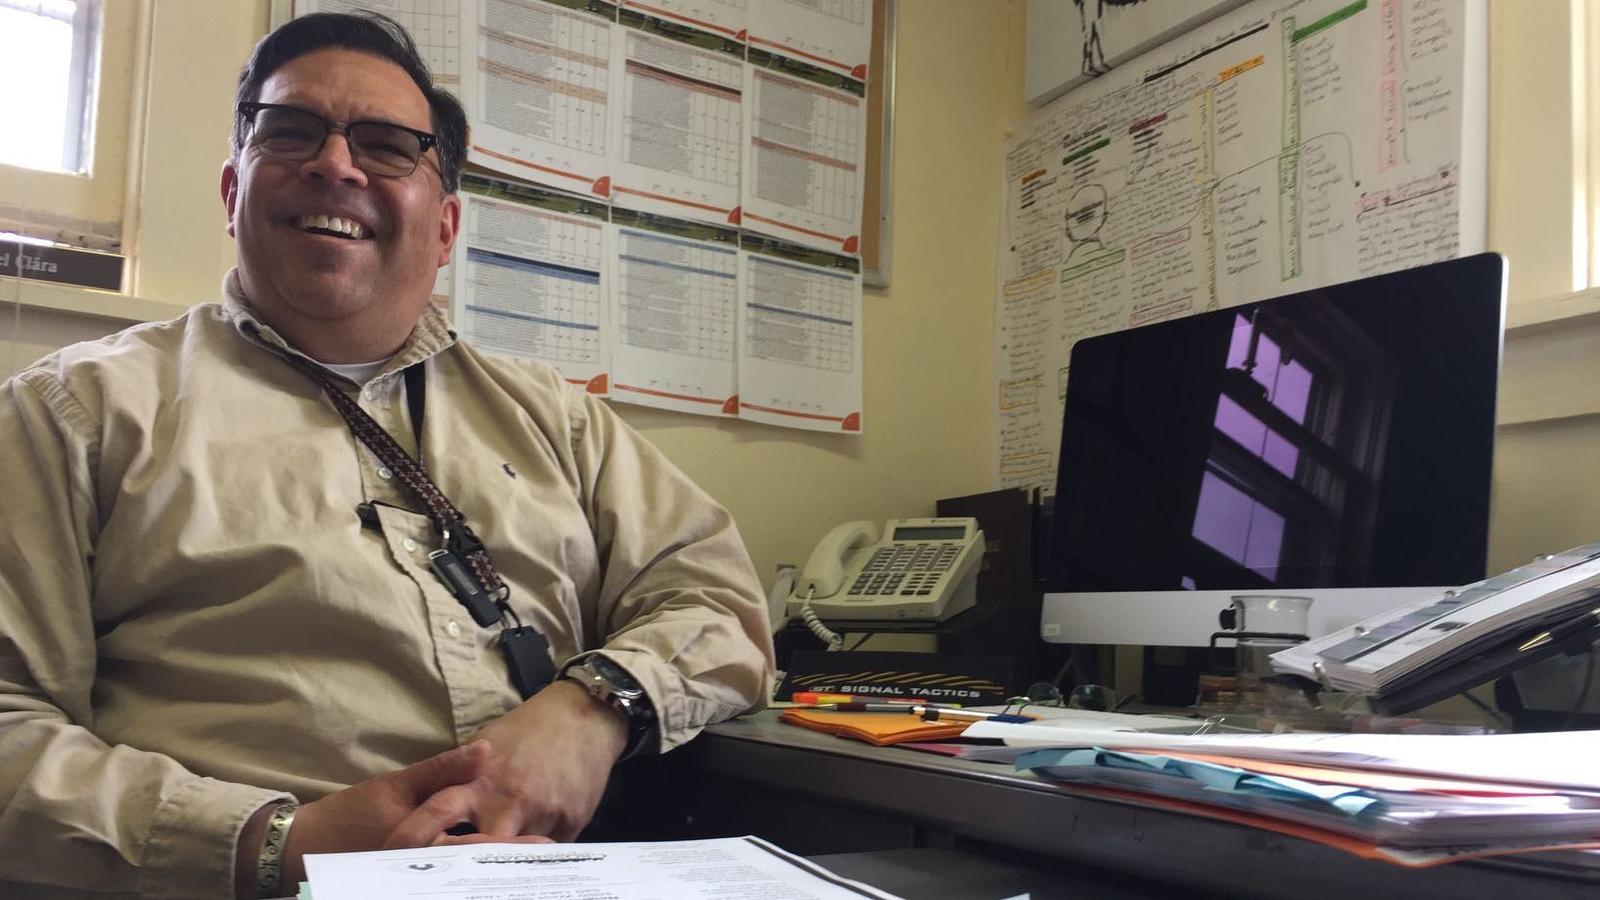 Essential education new school rating tool launches la - David montero ...